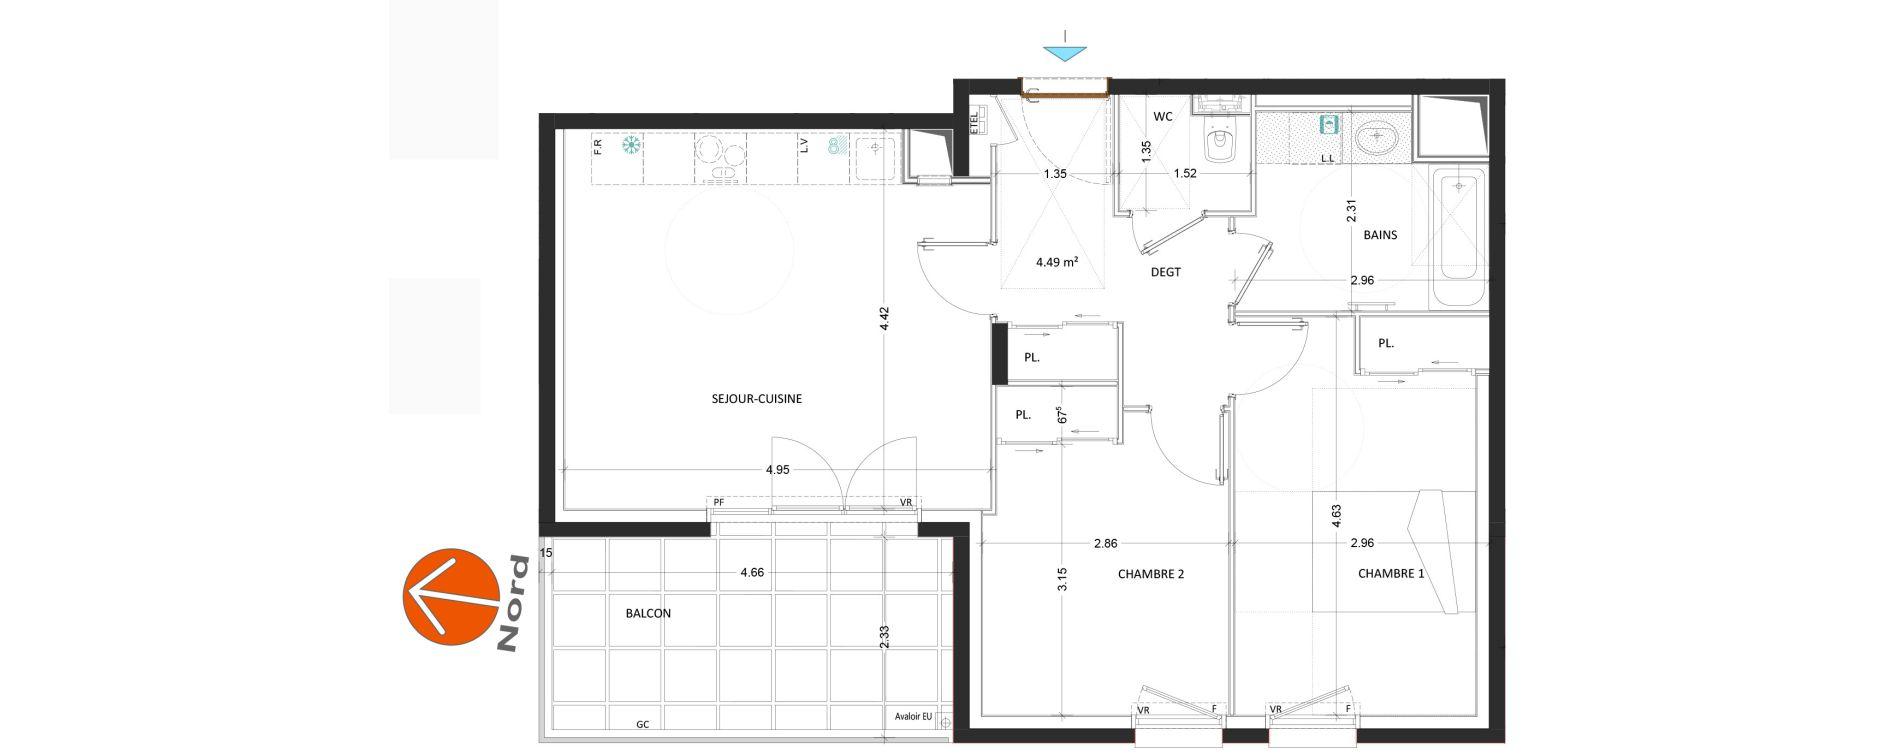 Appartement T3 de 59,49 m2 à Annecy Annecy seynod